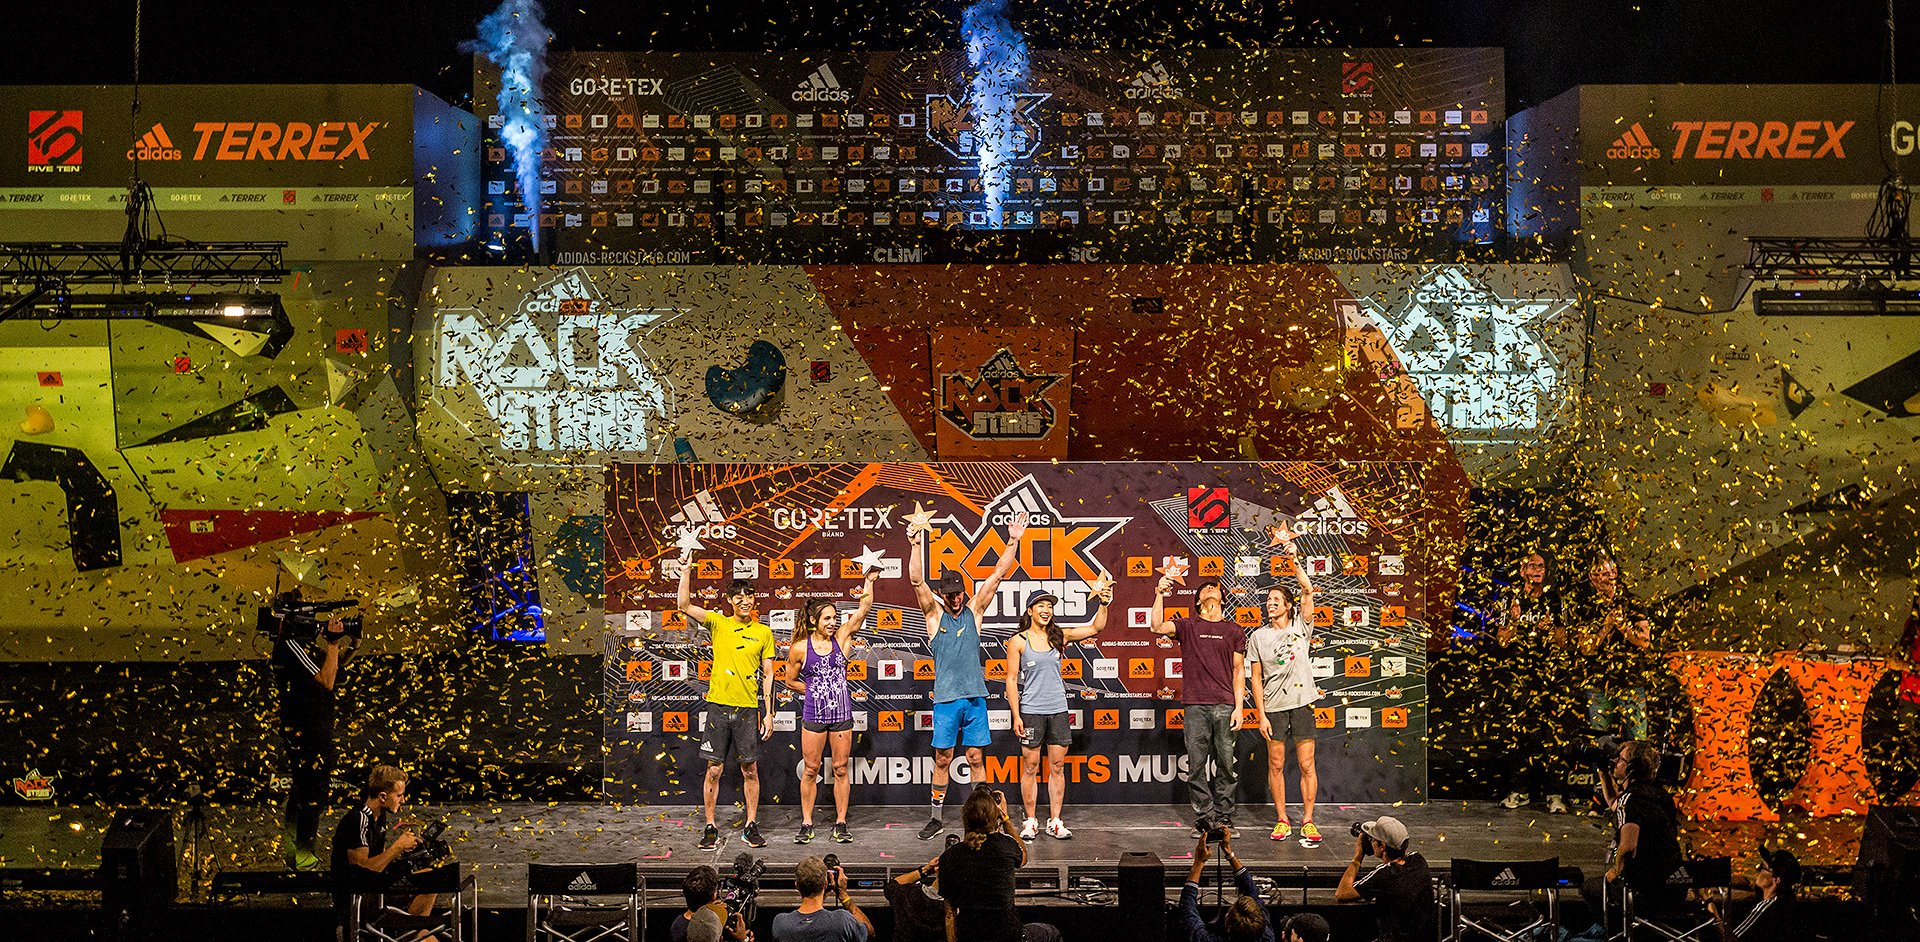 adidas ROCKSTARS superfinale